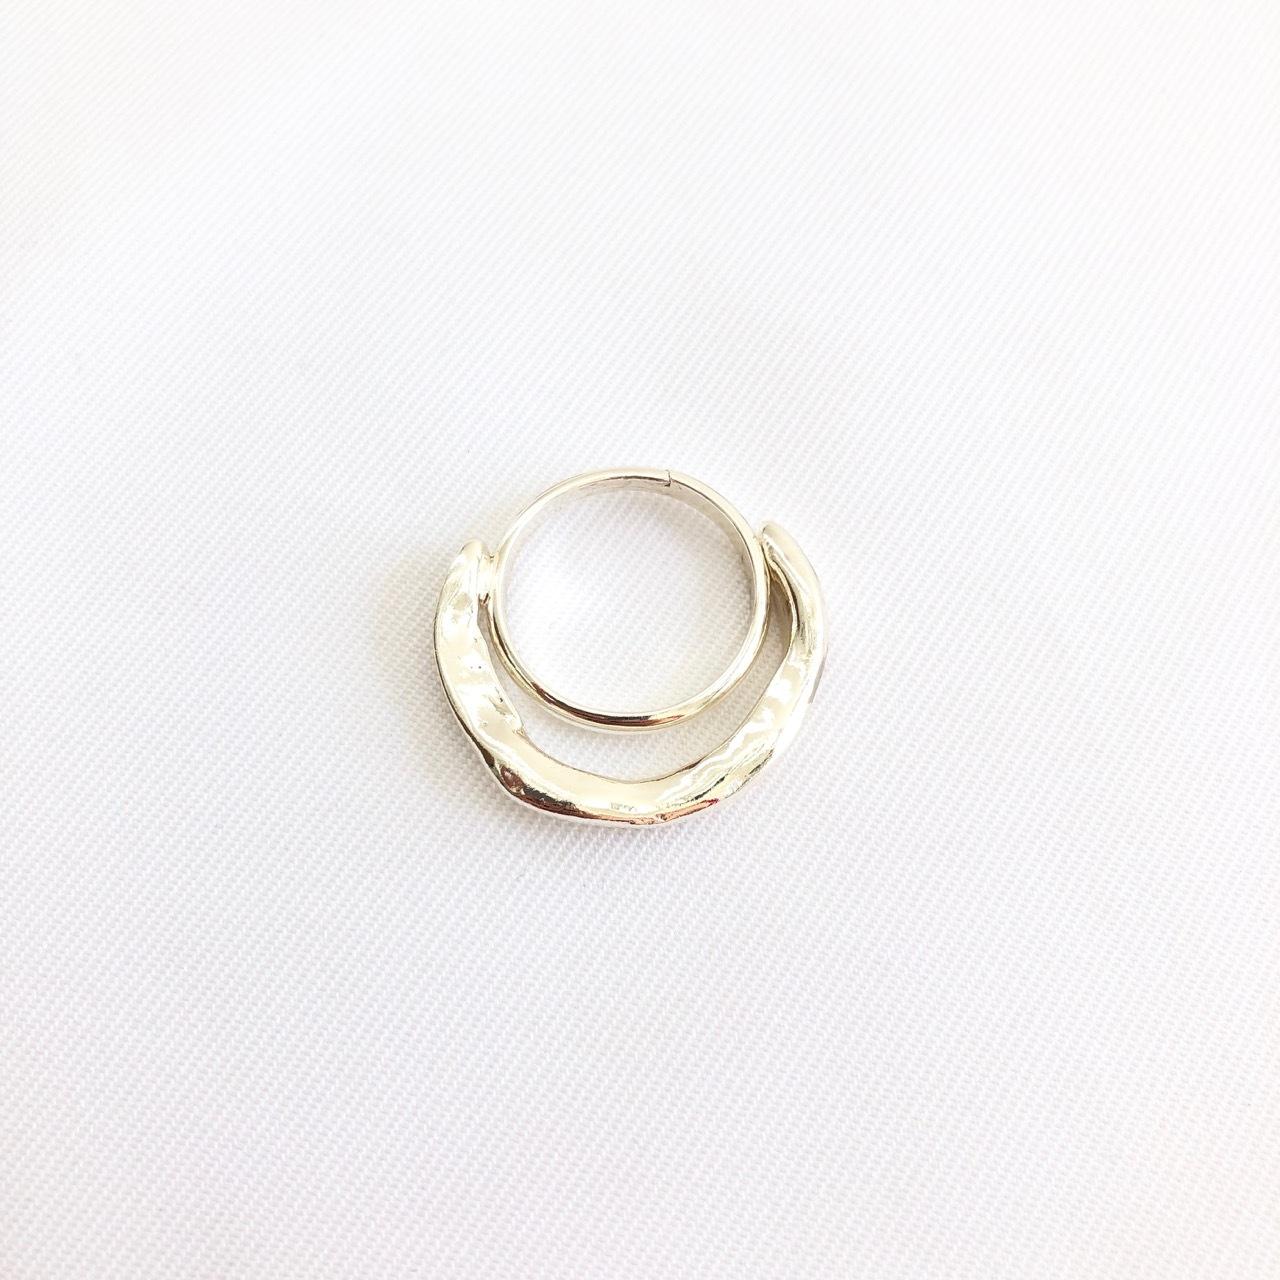 【 SeadsMara 】- 19A3-21 - petit wave ring